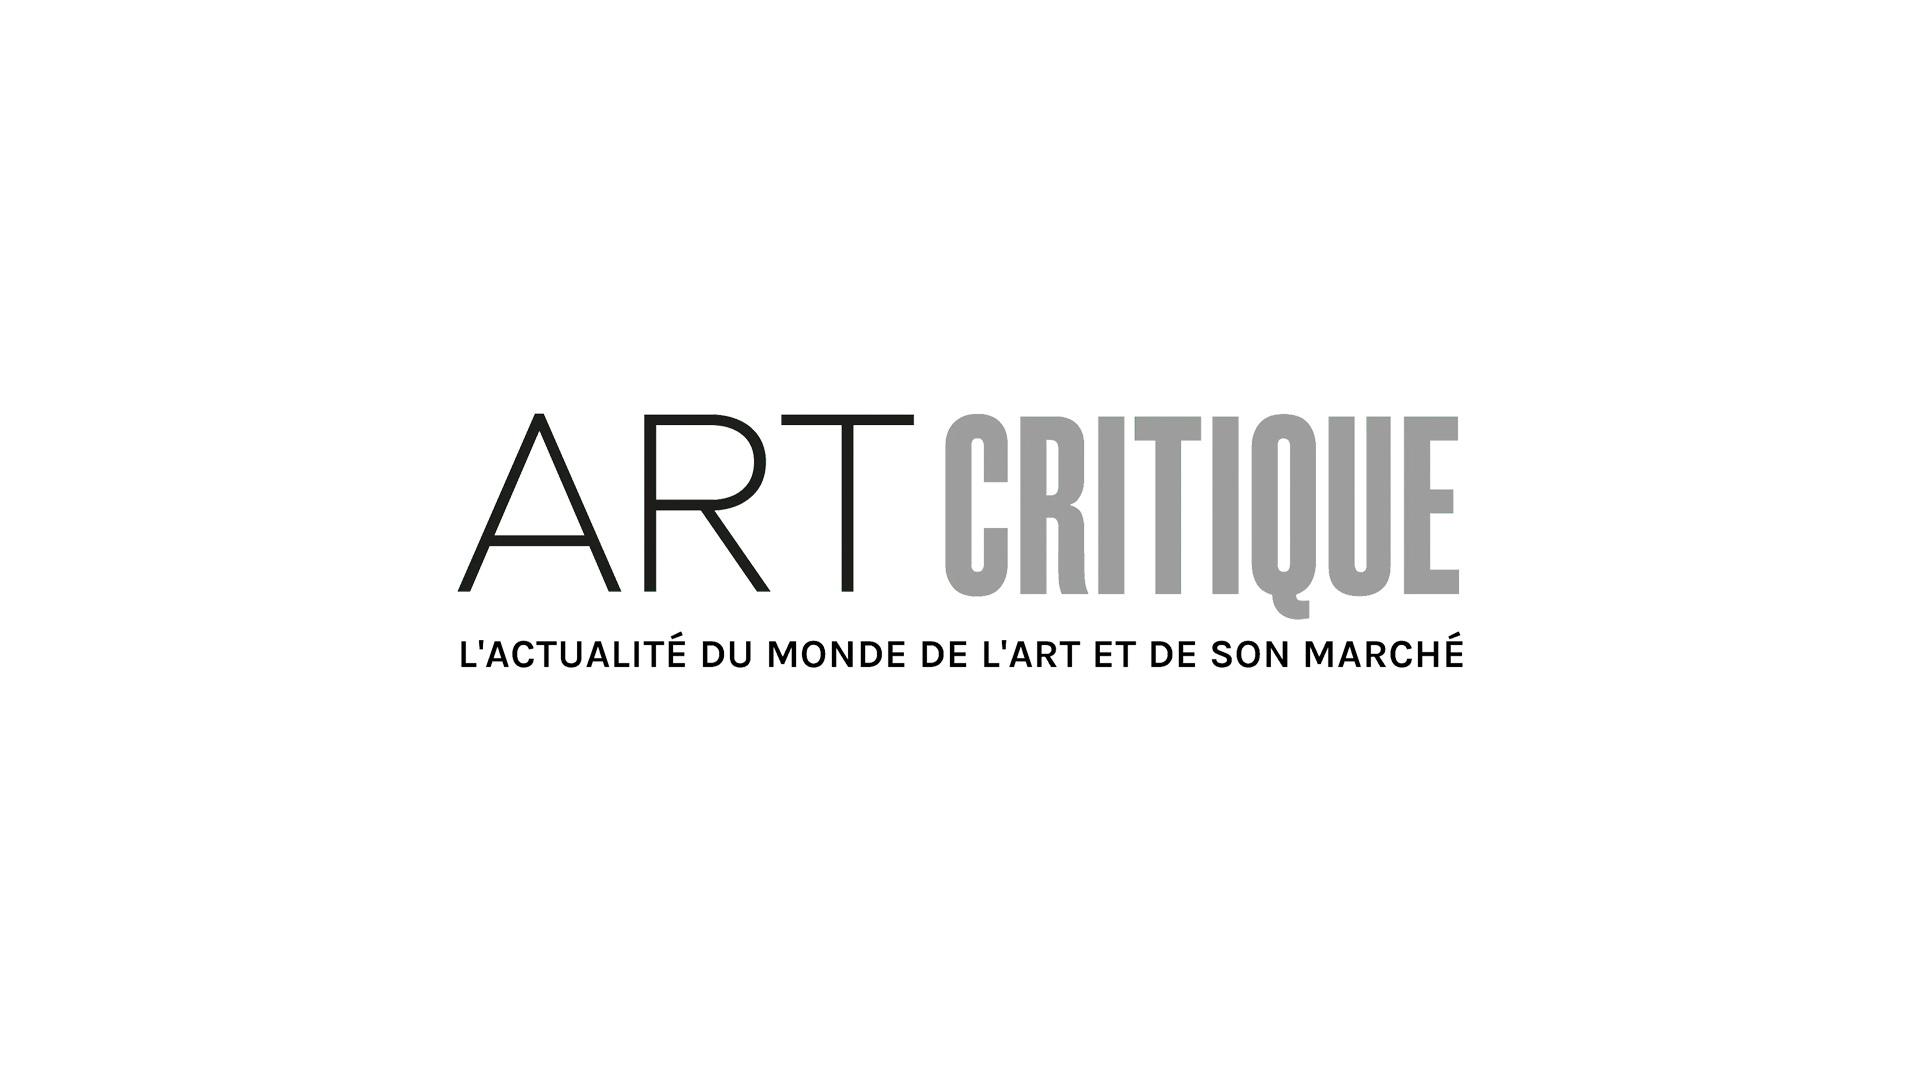 Leonardo da Vinci loans spark tensions between France and Italy